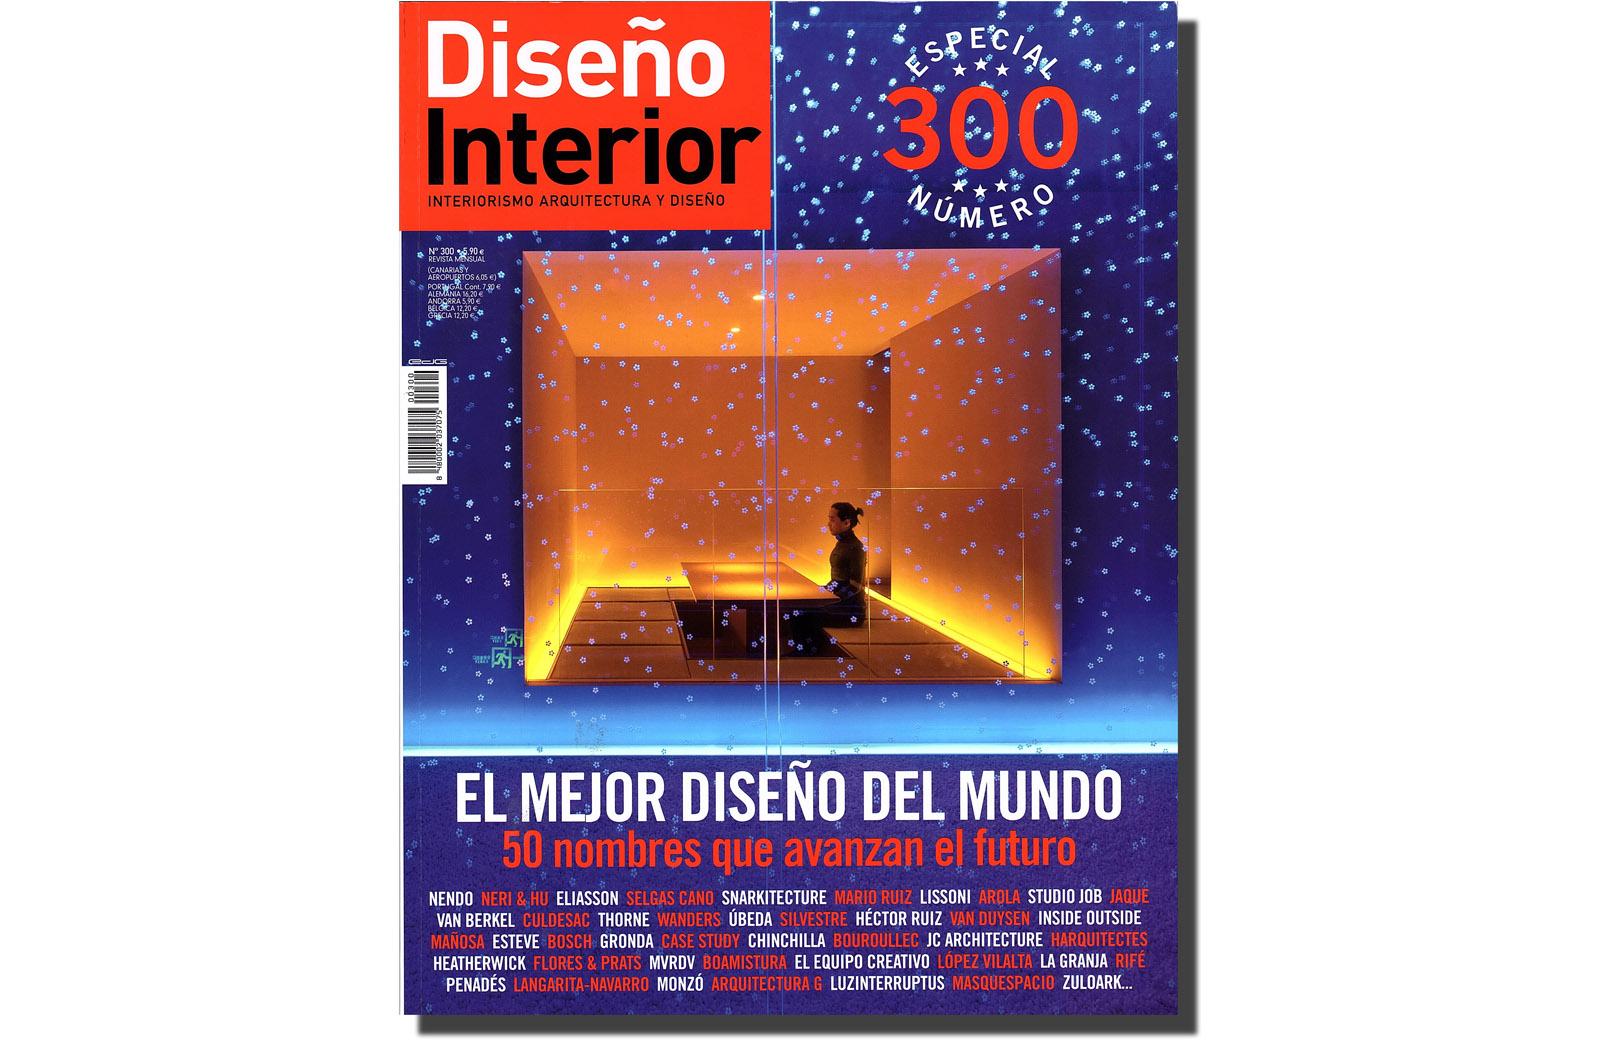 diseno-interior_entrevista-a-jaime-y-paloma_portada